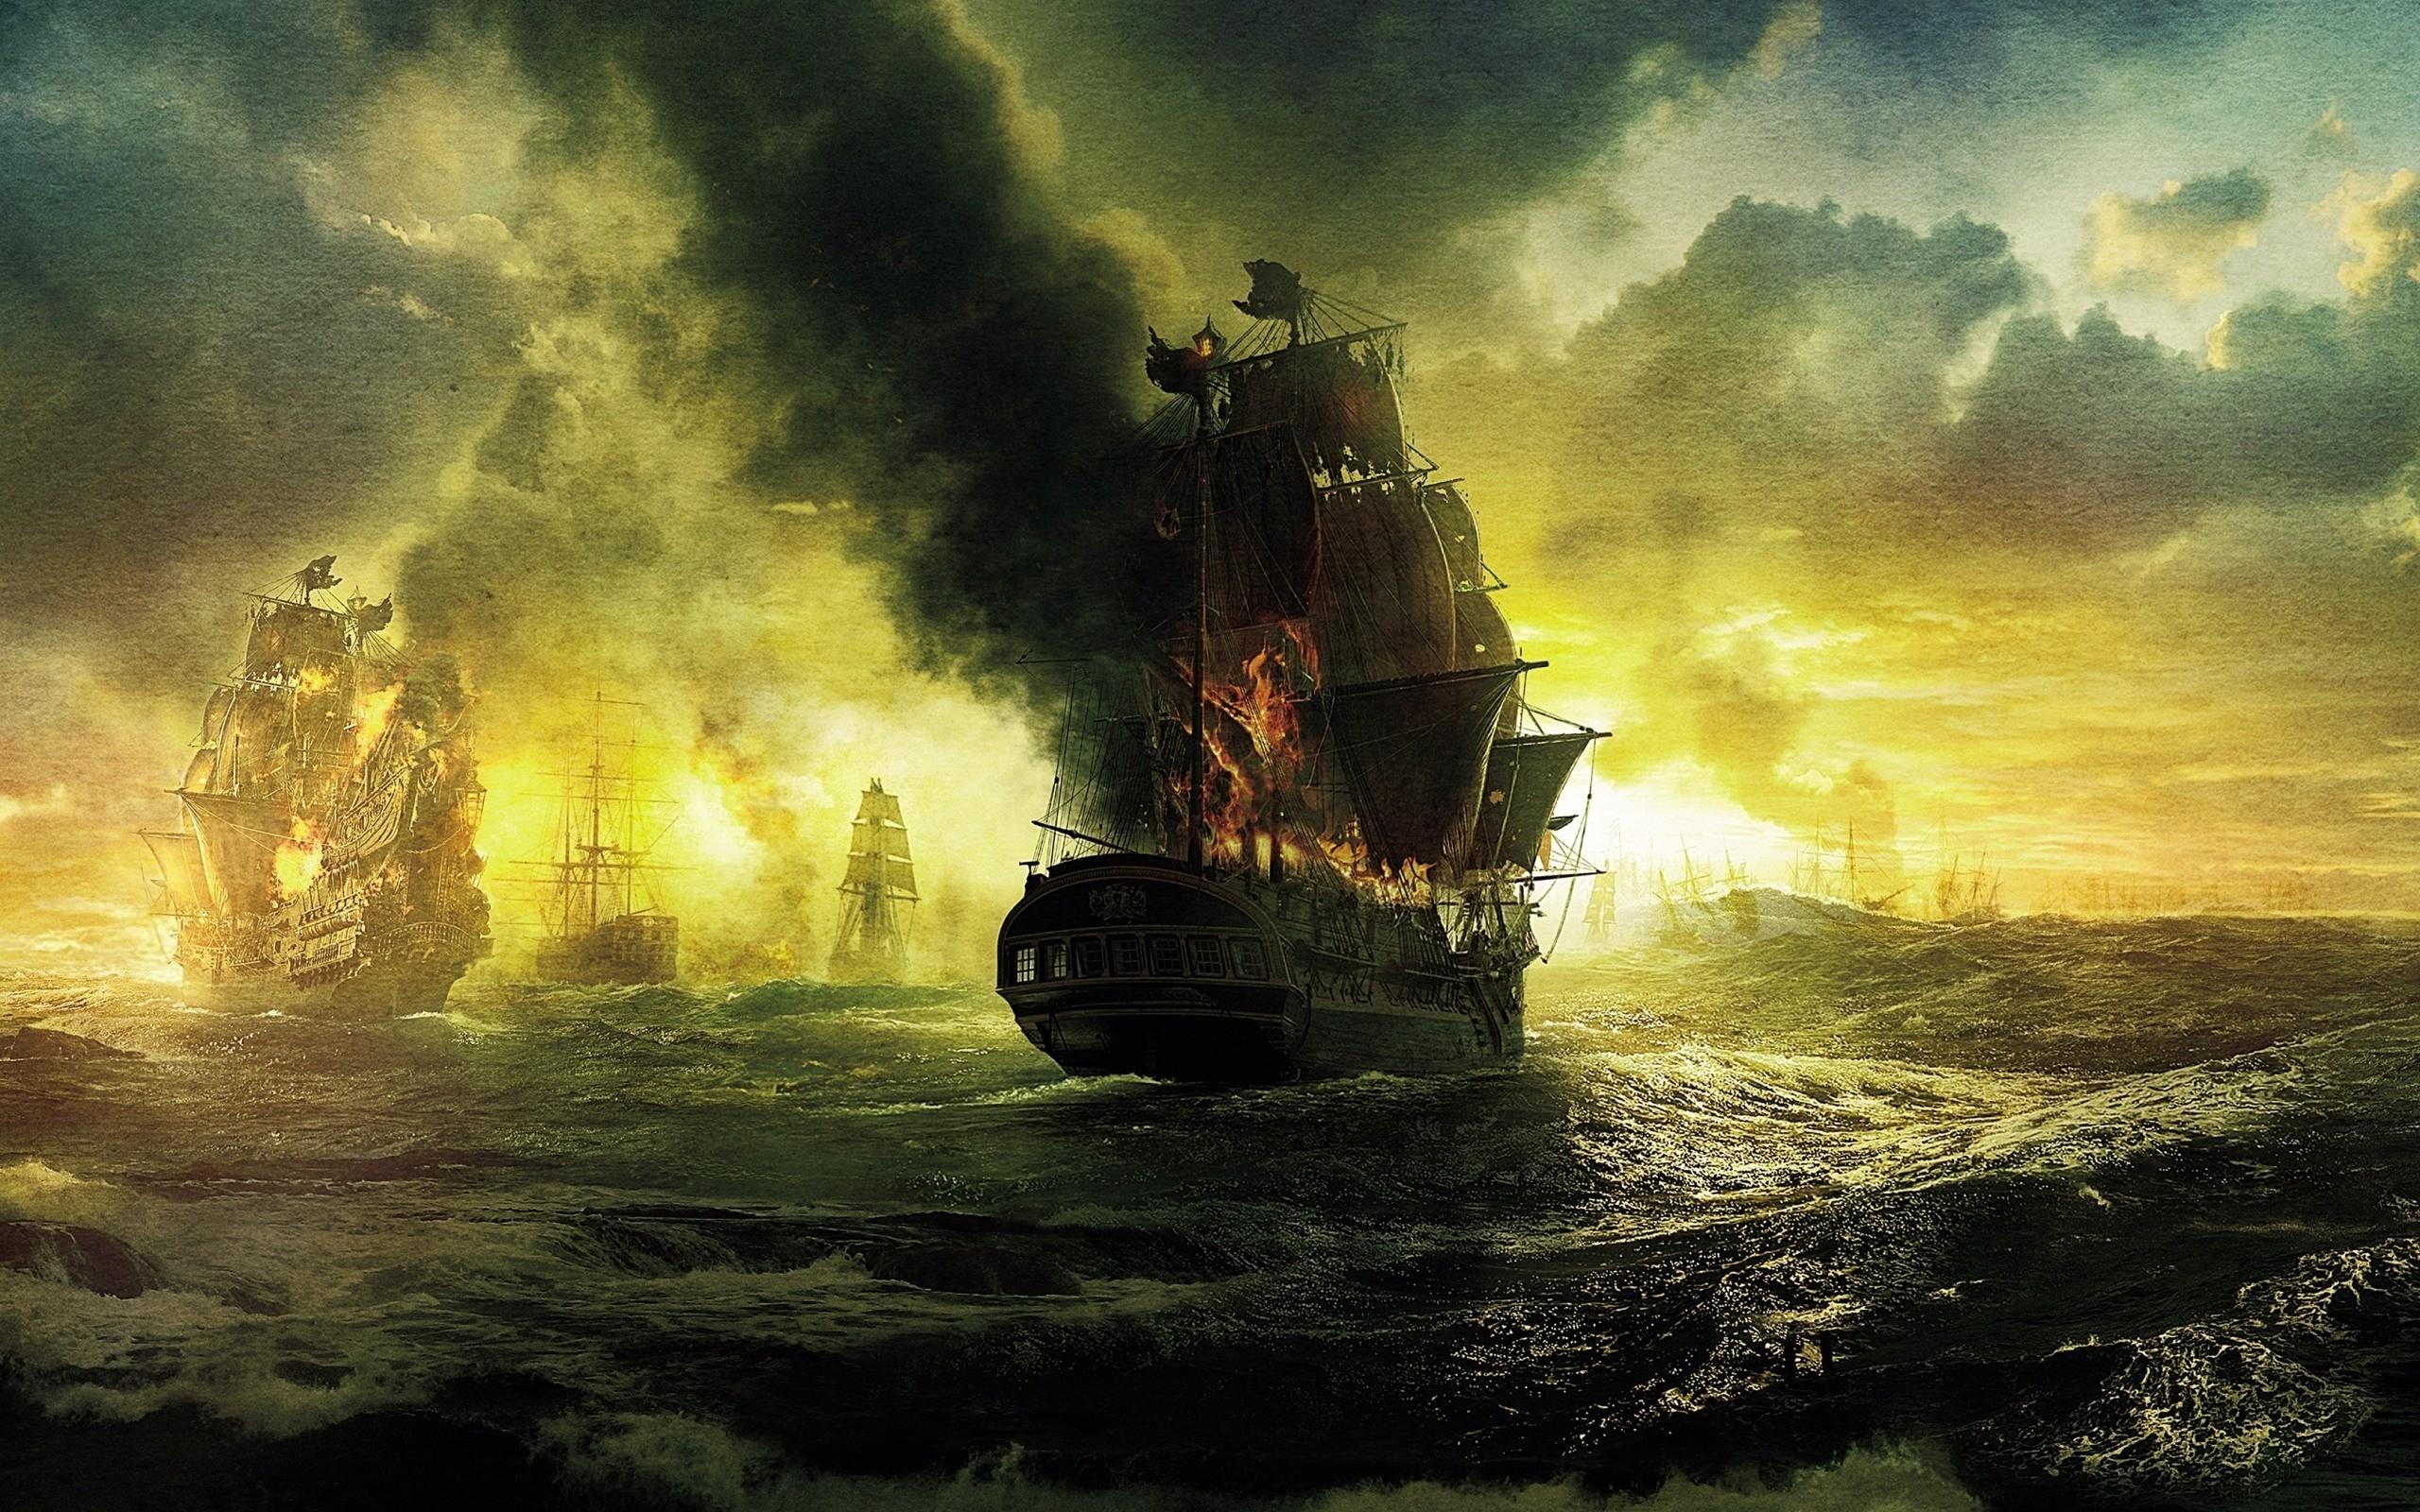 pirates of the caribbean wallpaper – Pesquisa Google